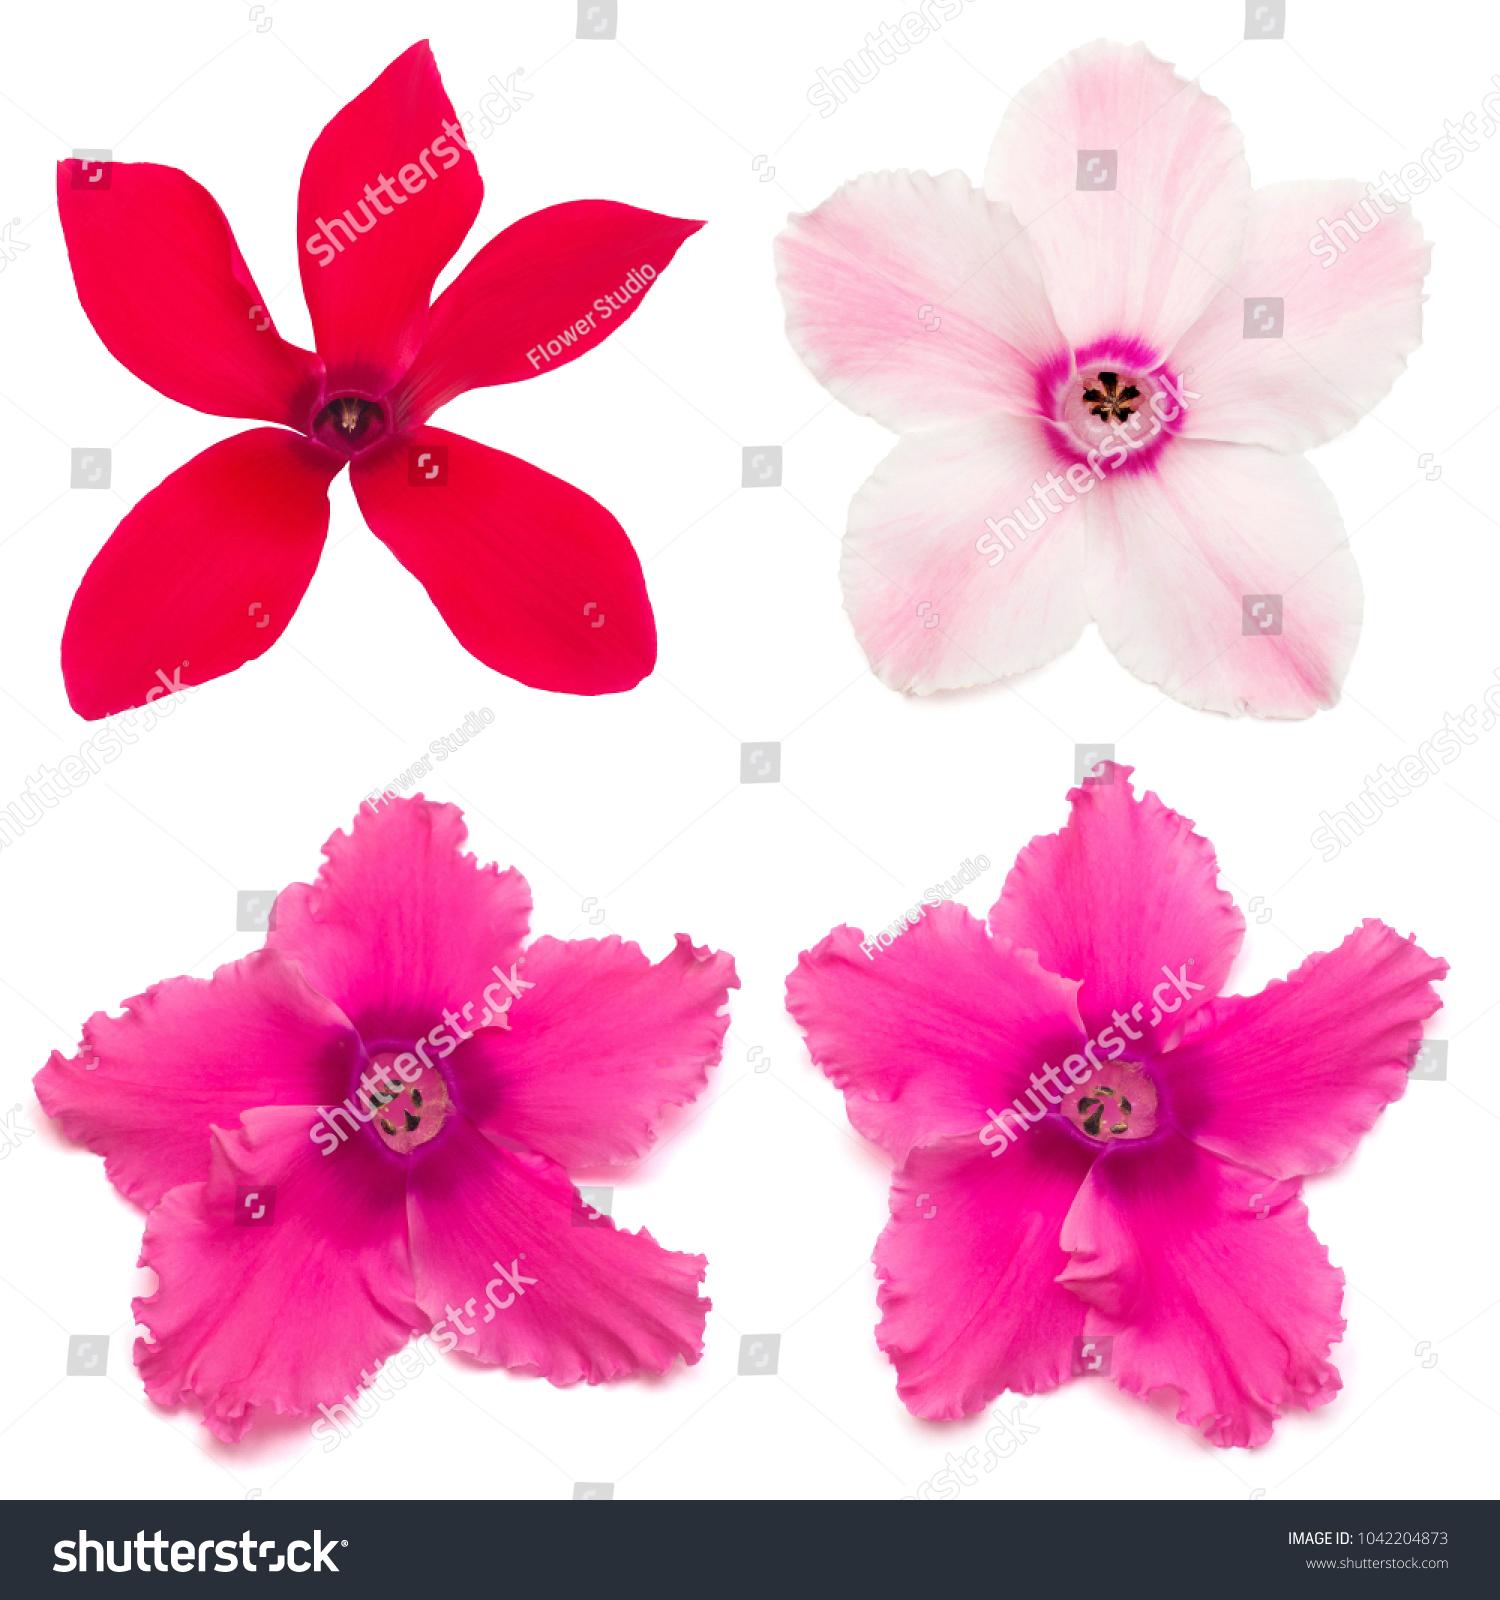 Hibiscus flower isolated flower die cut with path ez canvas izmirmasajfo